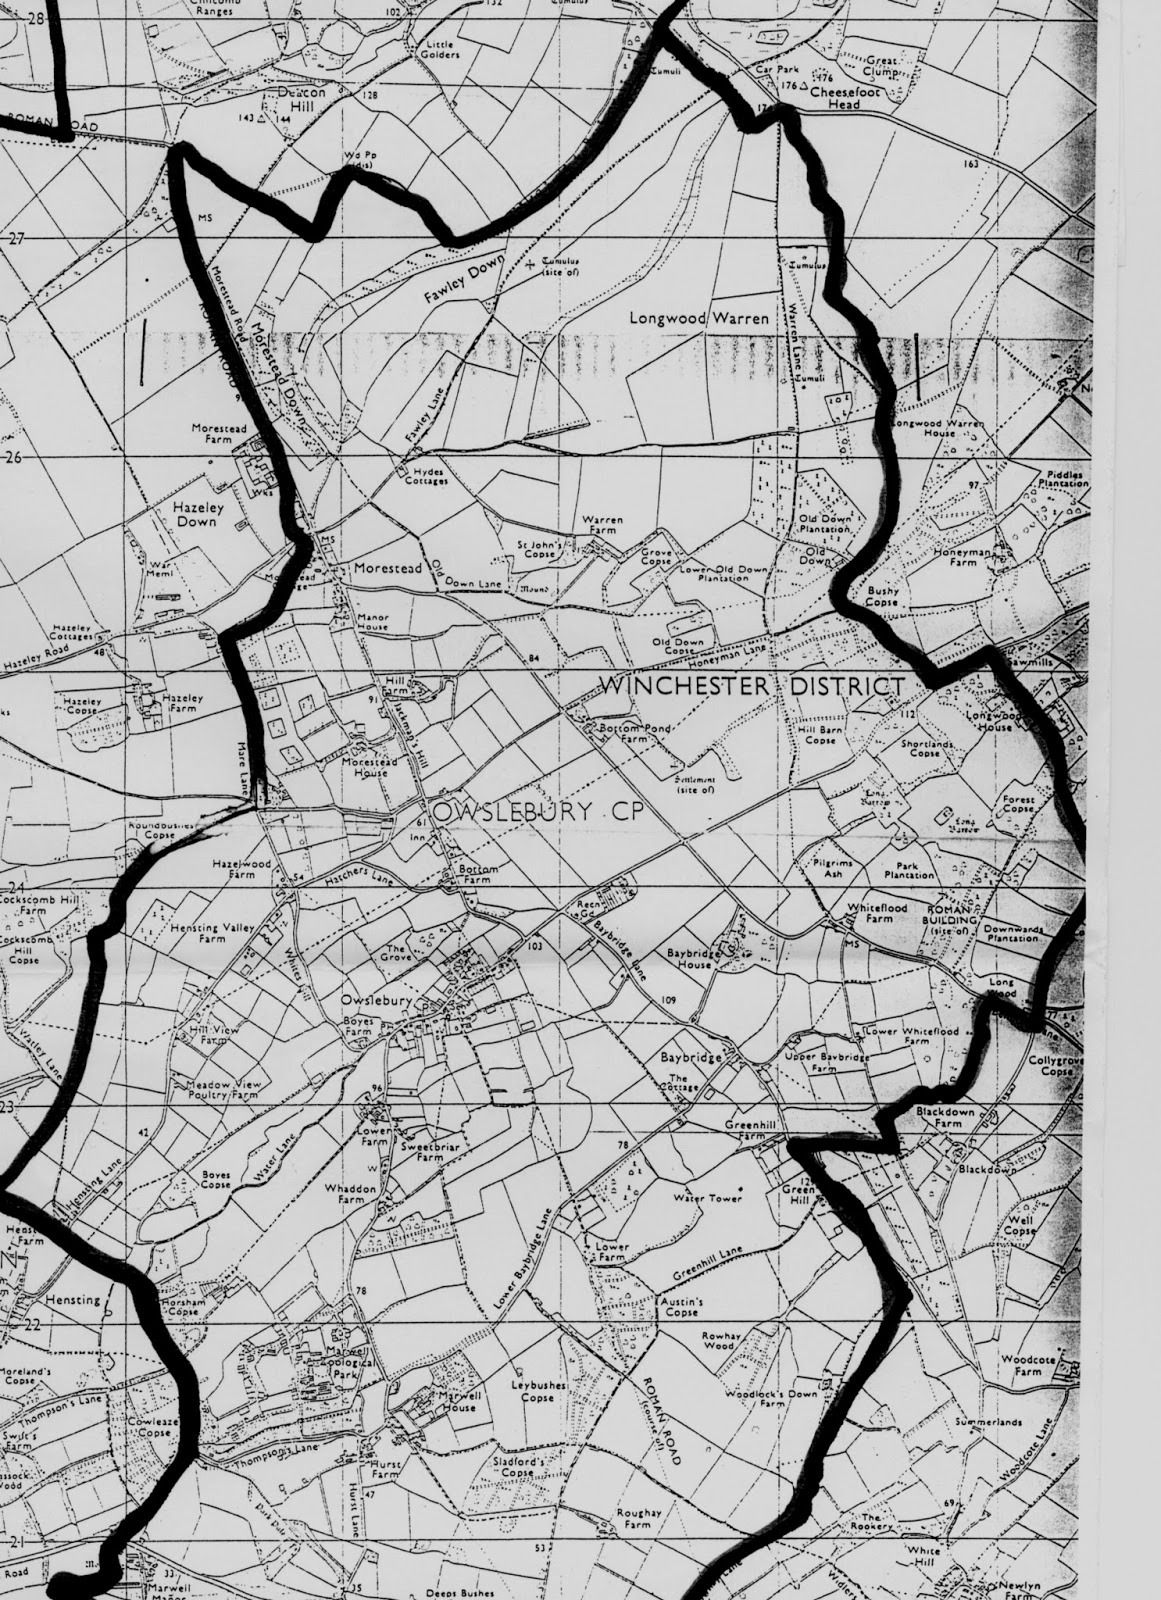 owslebury map showing old tracks bridleways and footpaths